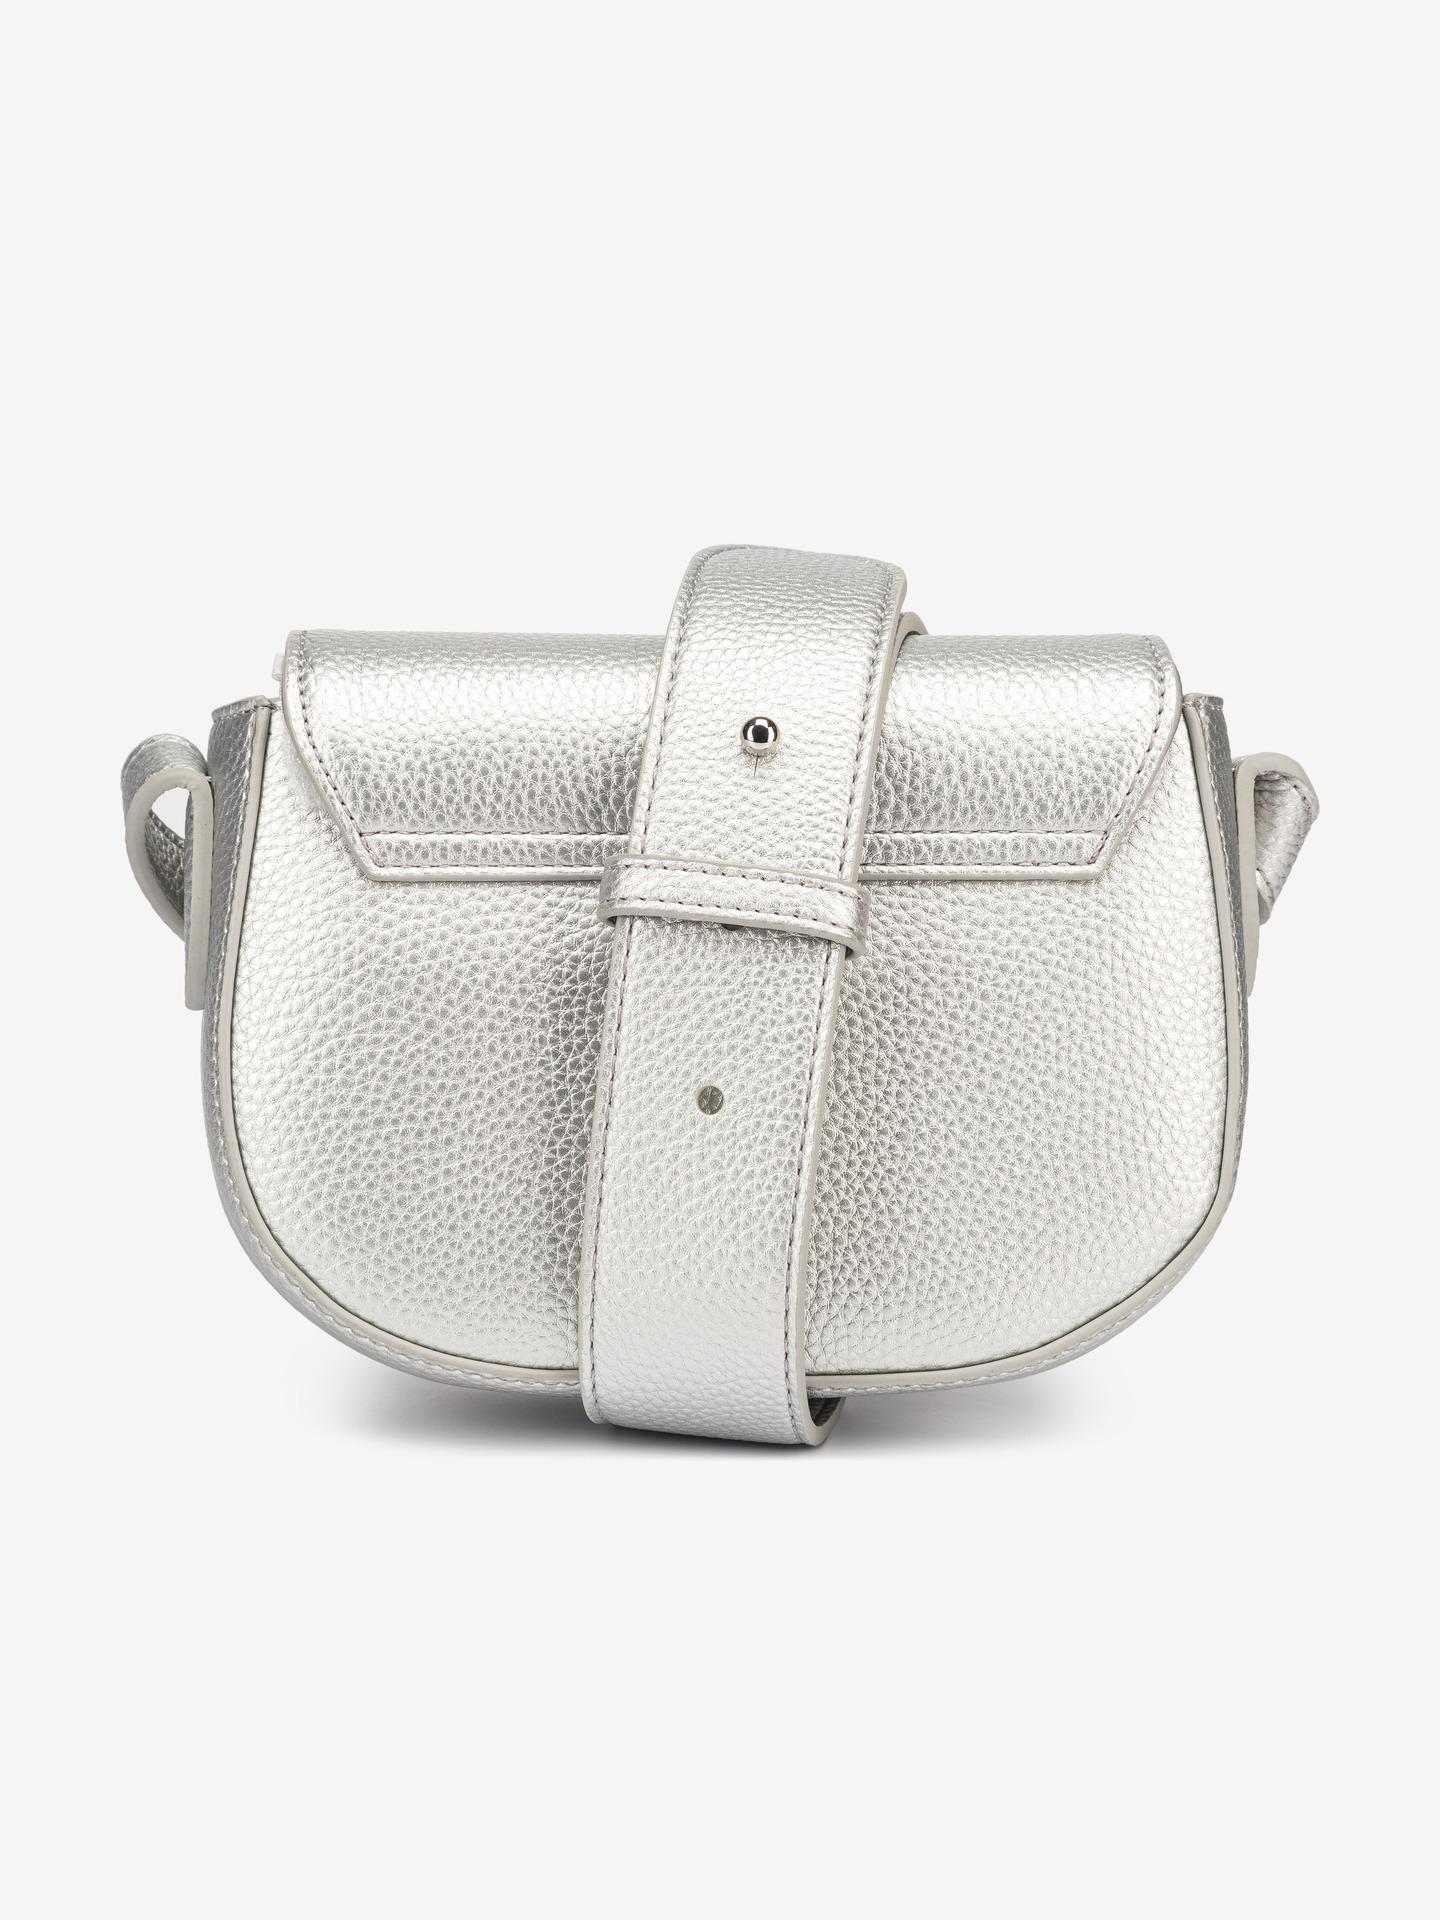 Armani Exchange silver handbag